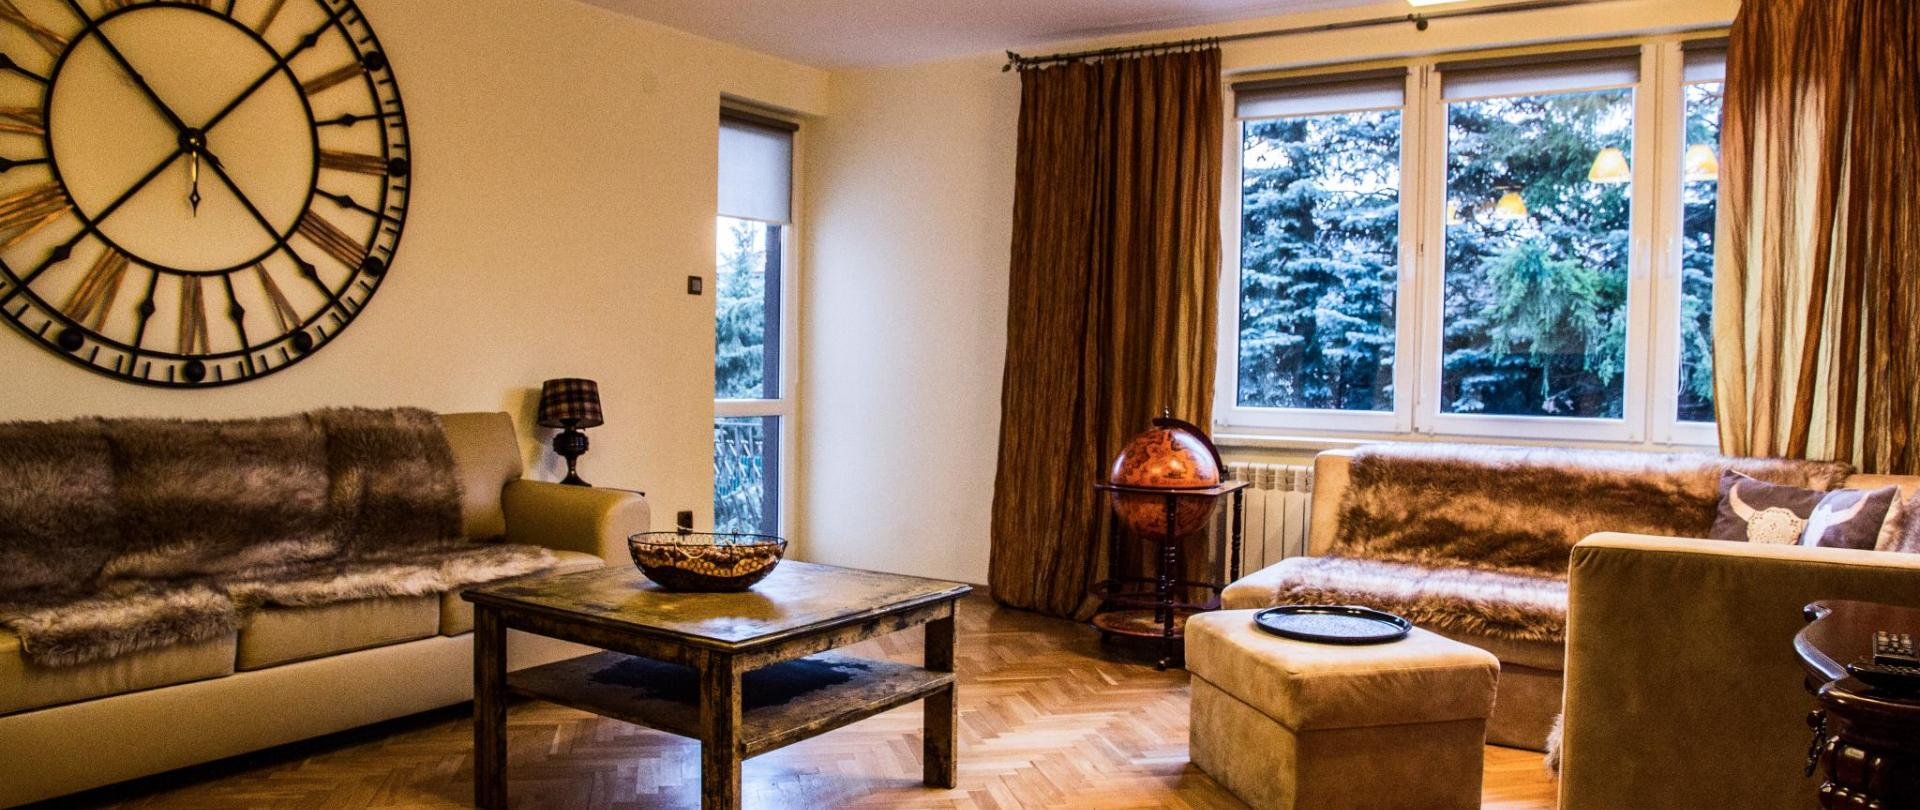 Apartamenty Pan Tadeusz